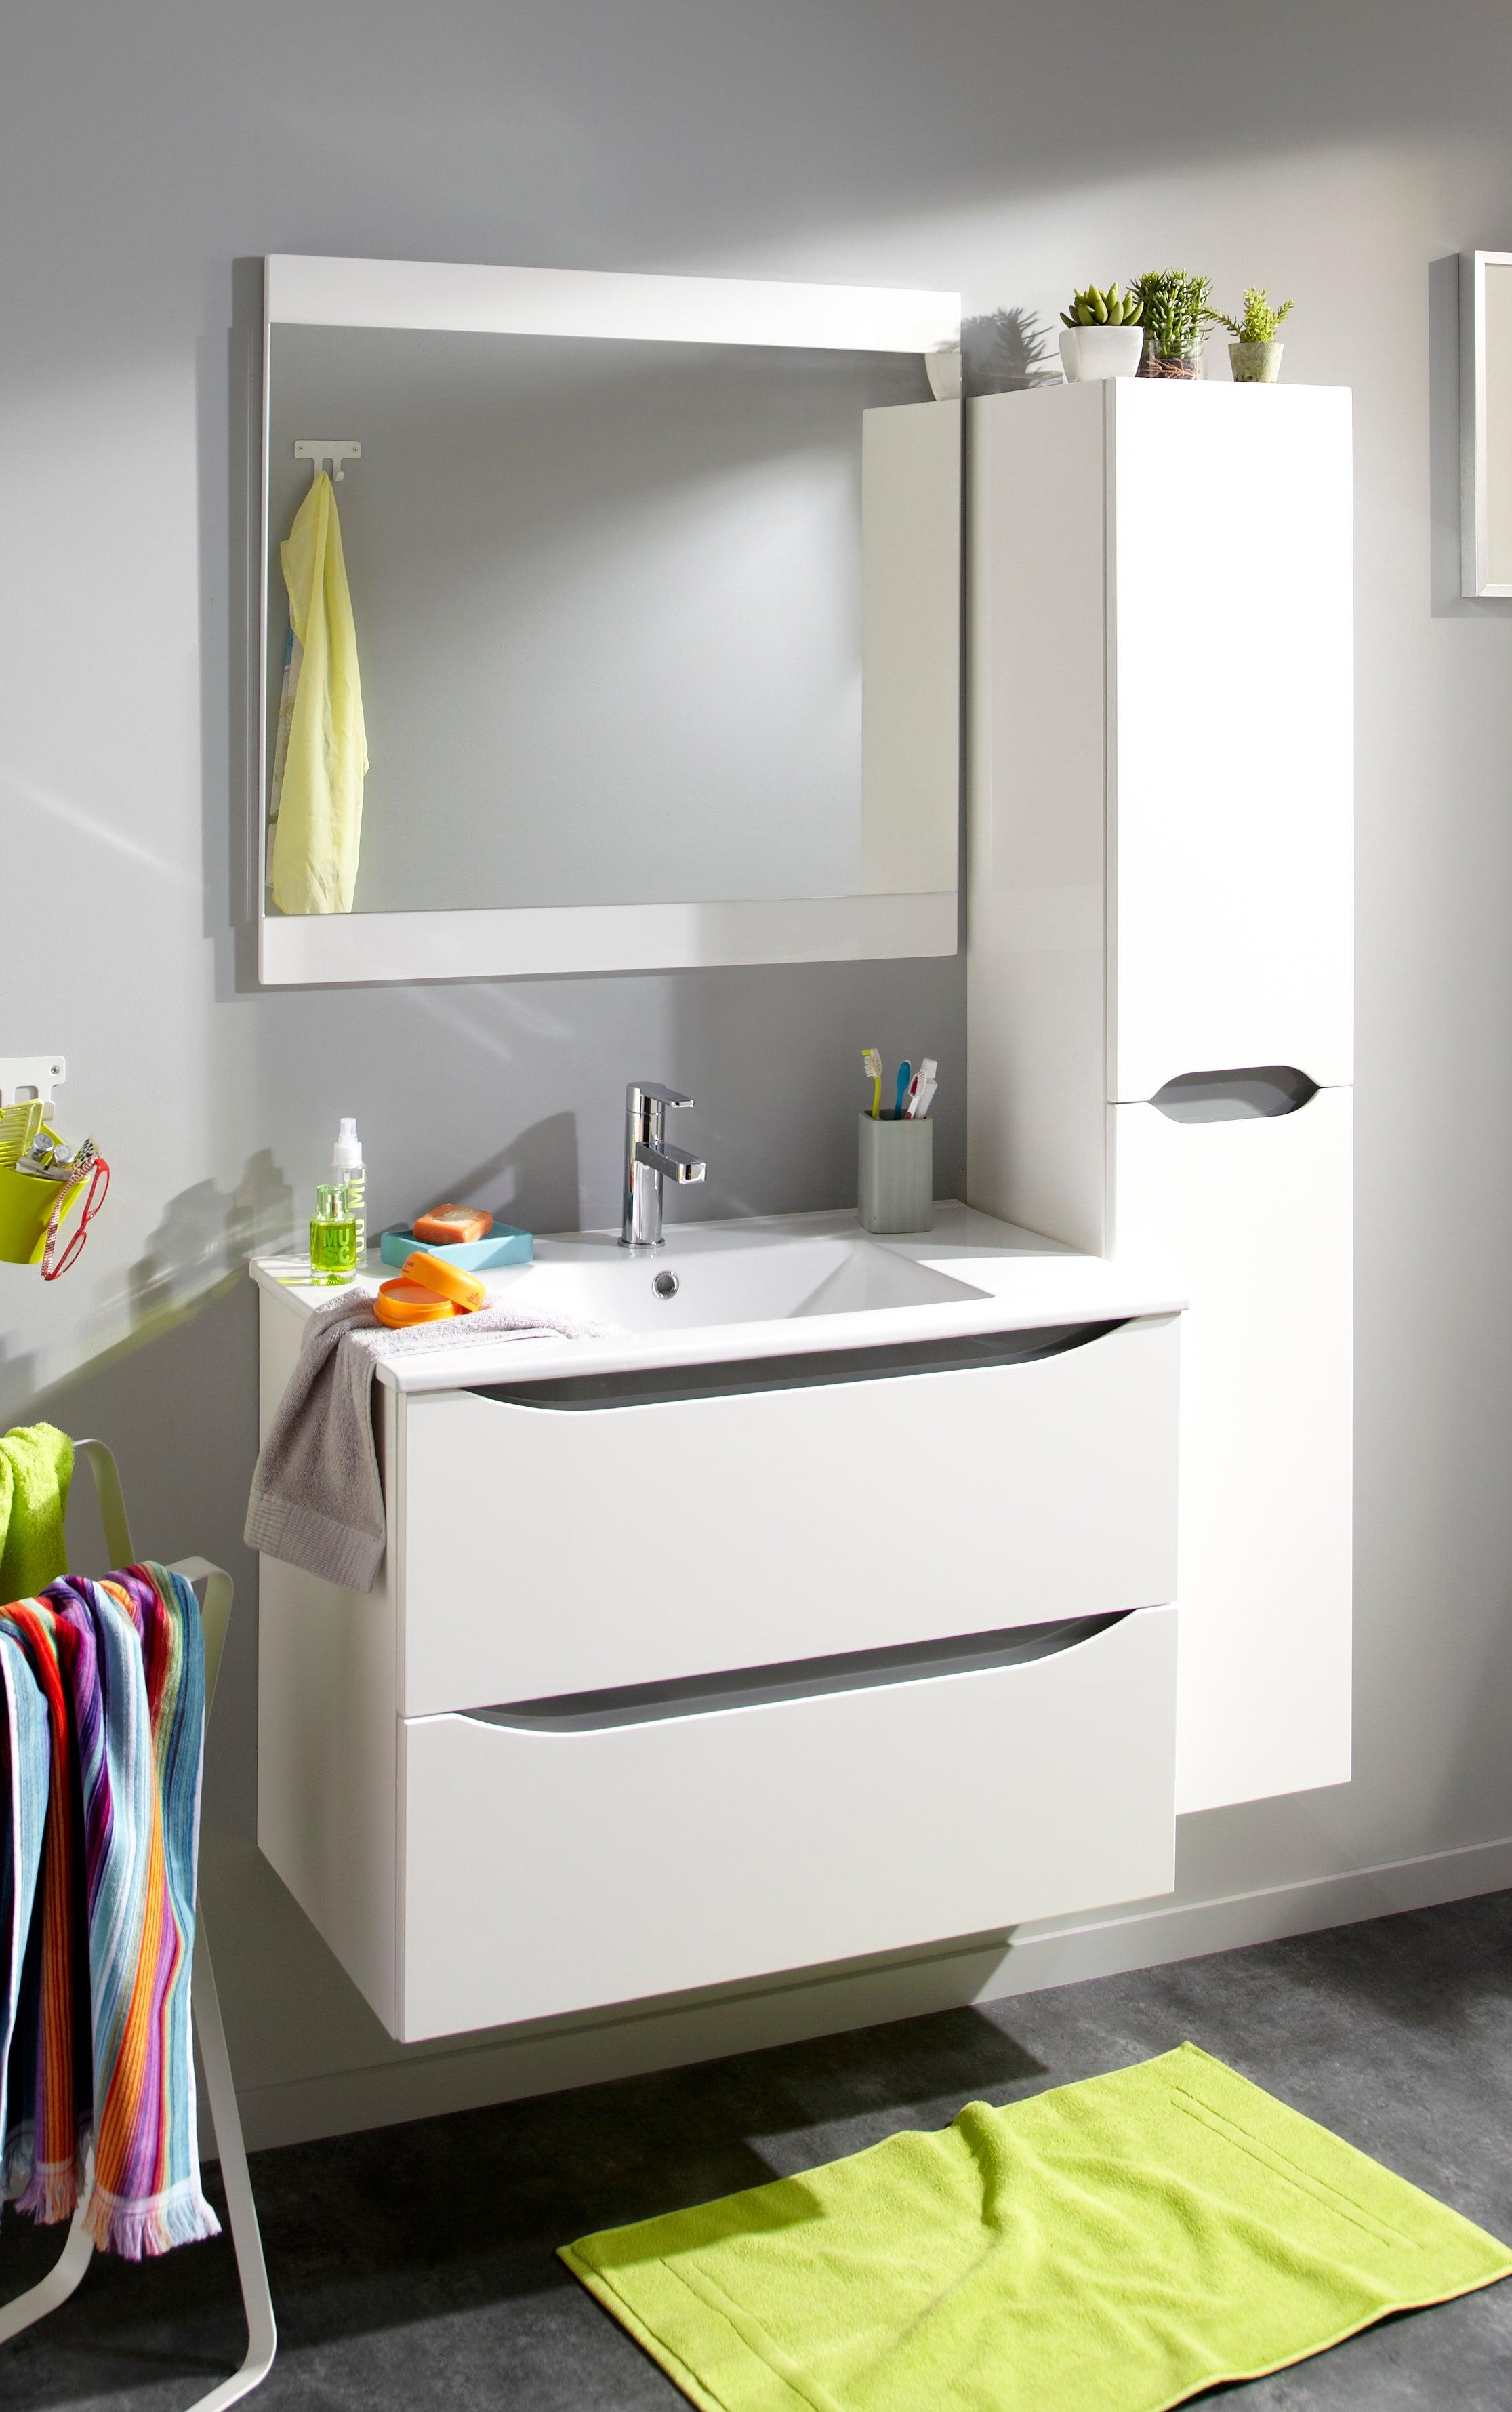 Meuble simple vasque l.20.20 x H.20 x P.20.20 cm, blanc, Smile